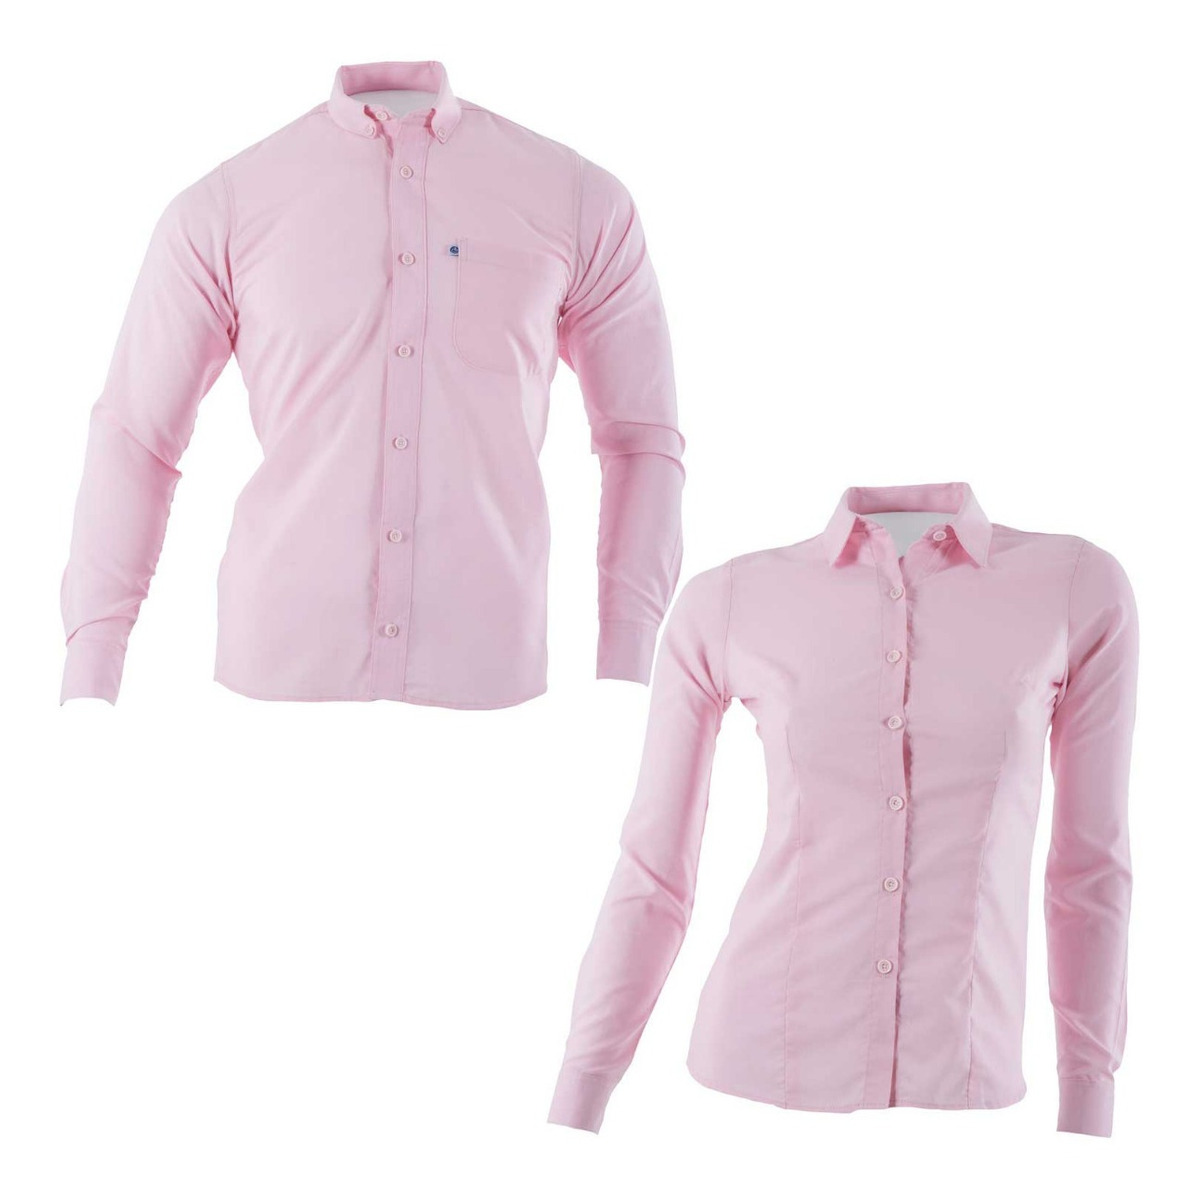 1fbe5a375f5c Camisa De Oficina Manga Larga 3xl Y 4xl Para Mujer